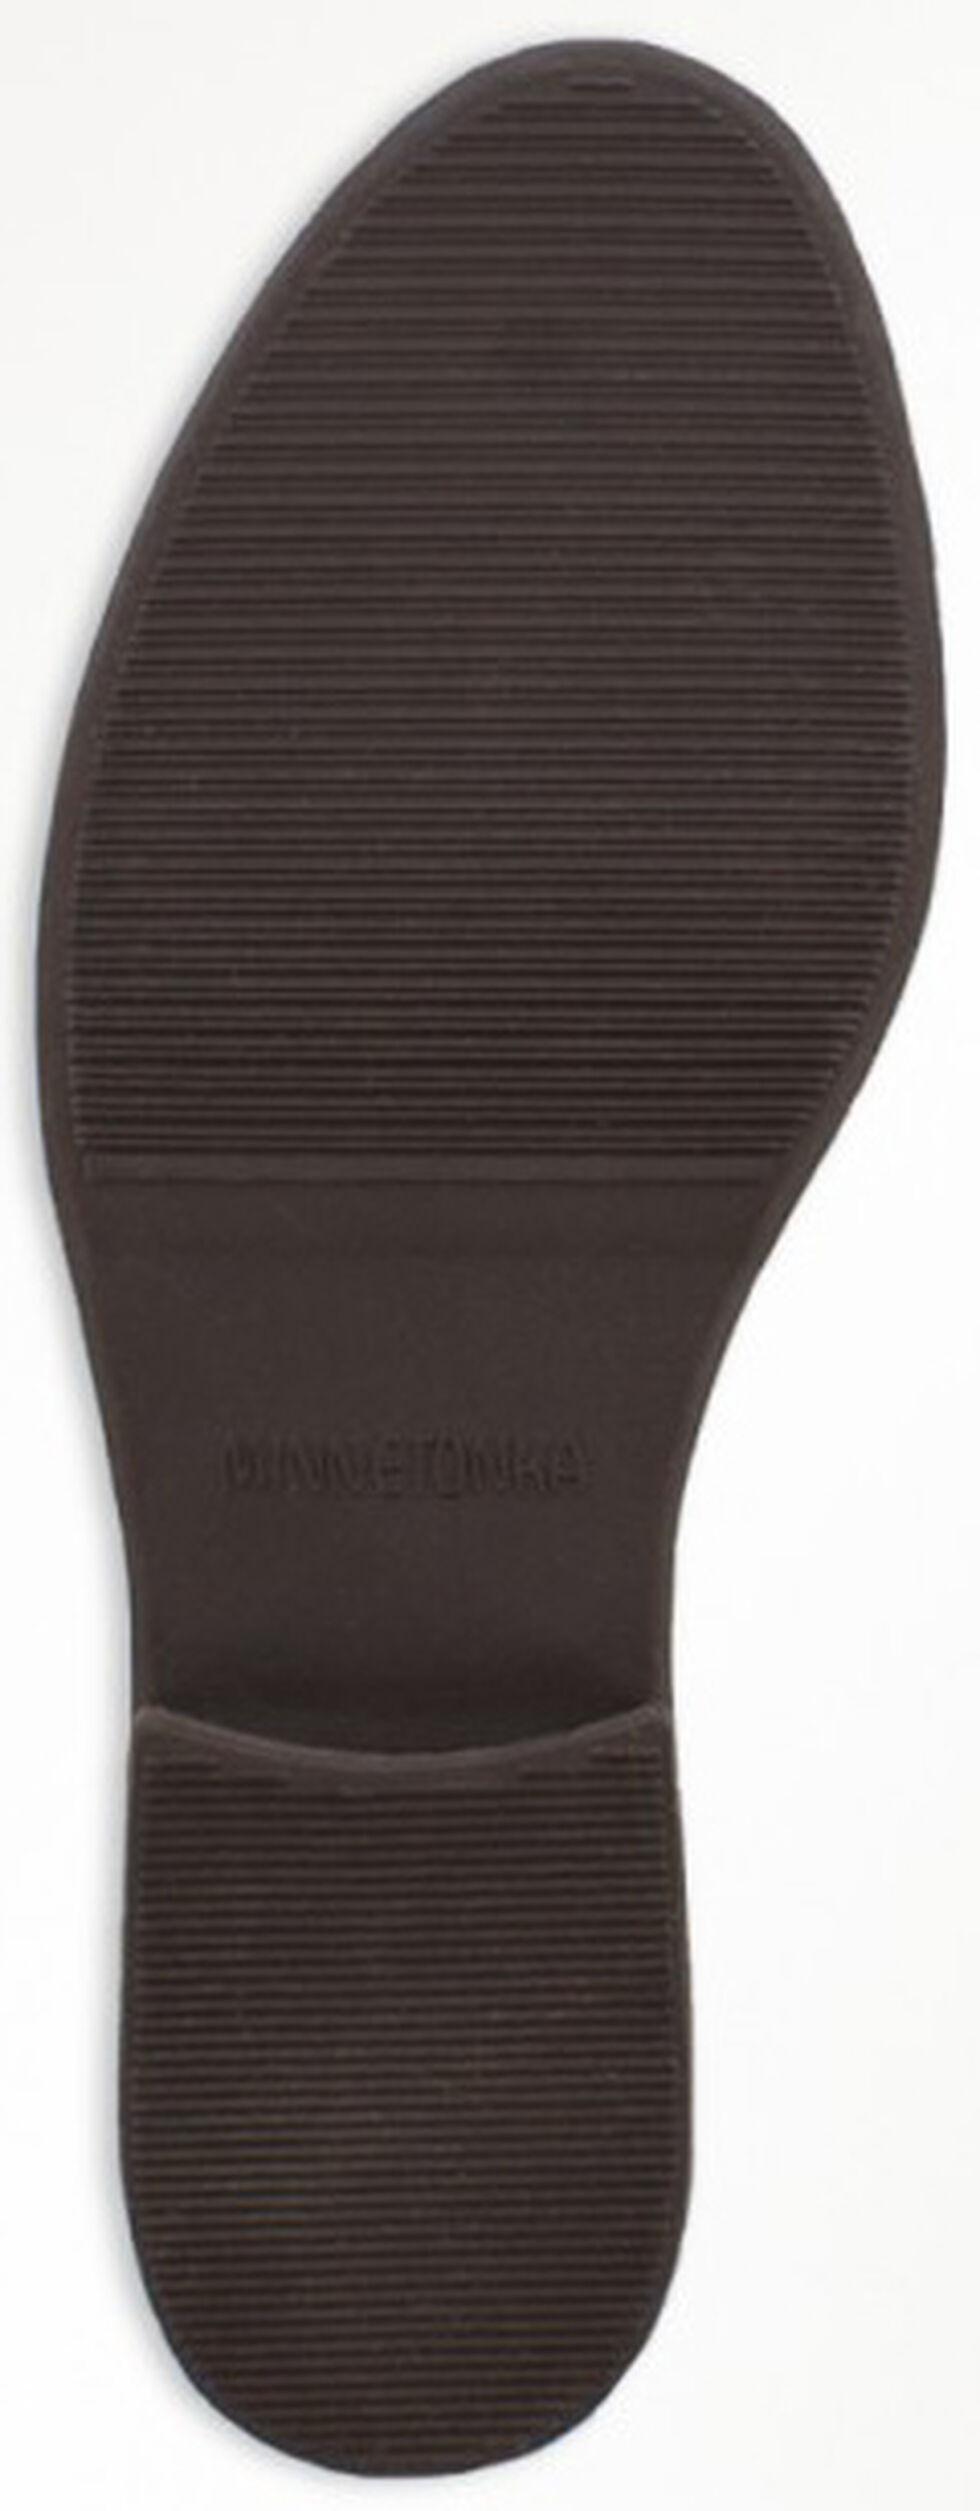 Minnetonka Women's Dixon Booties - Round Toe, Dusty Brn, hi-res